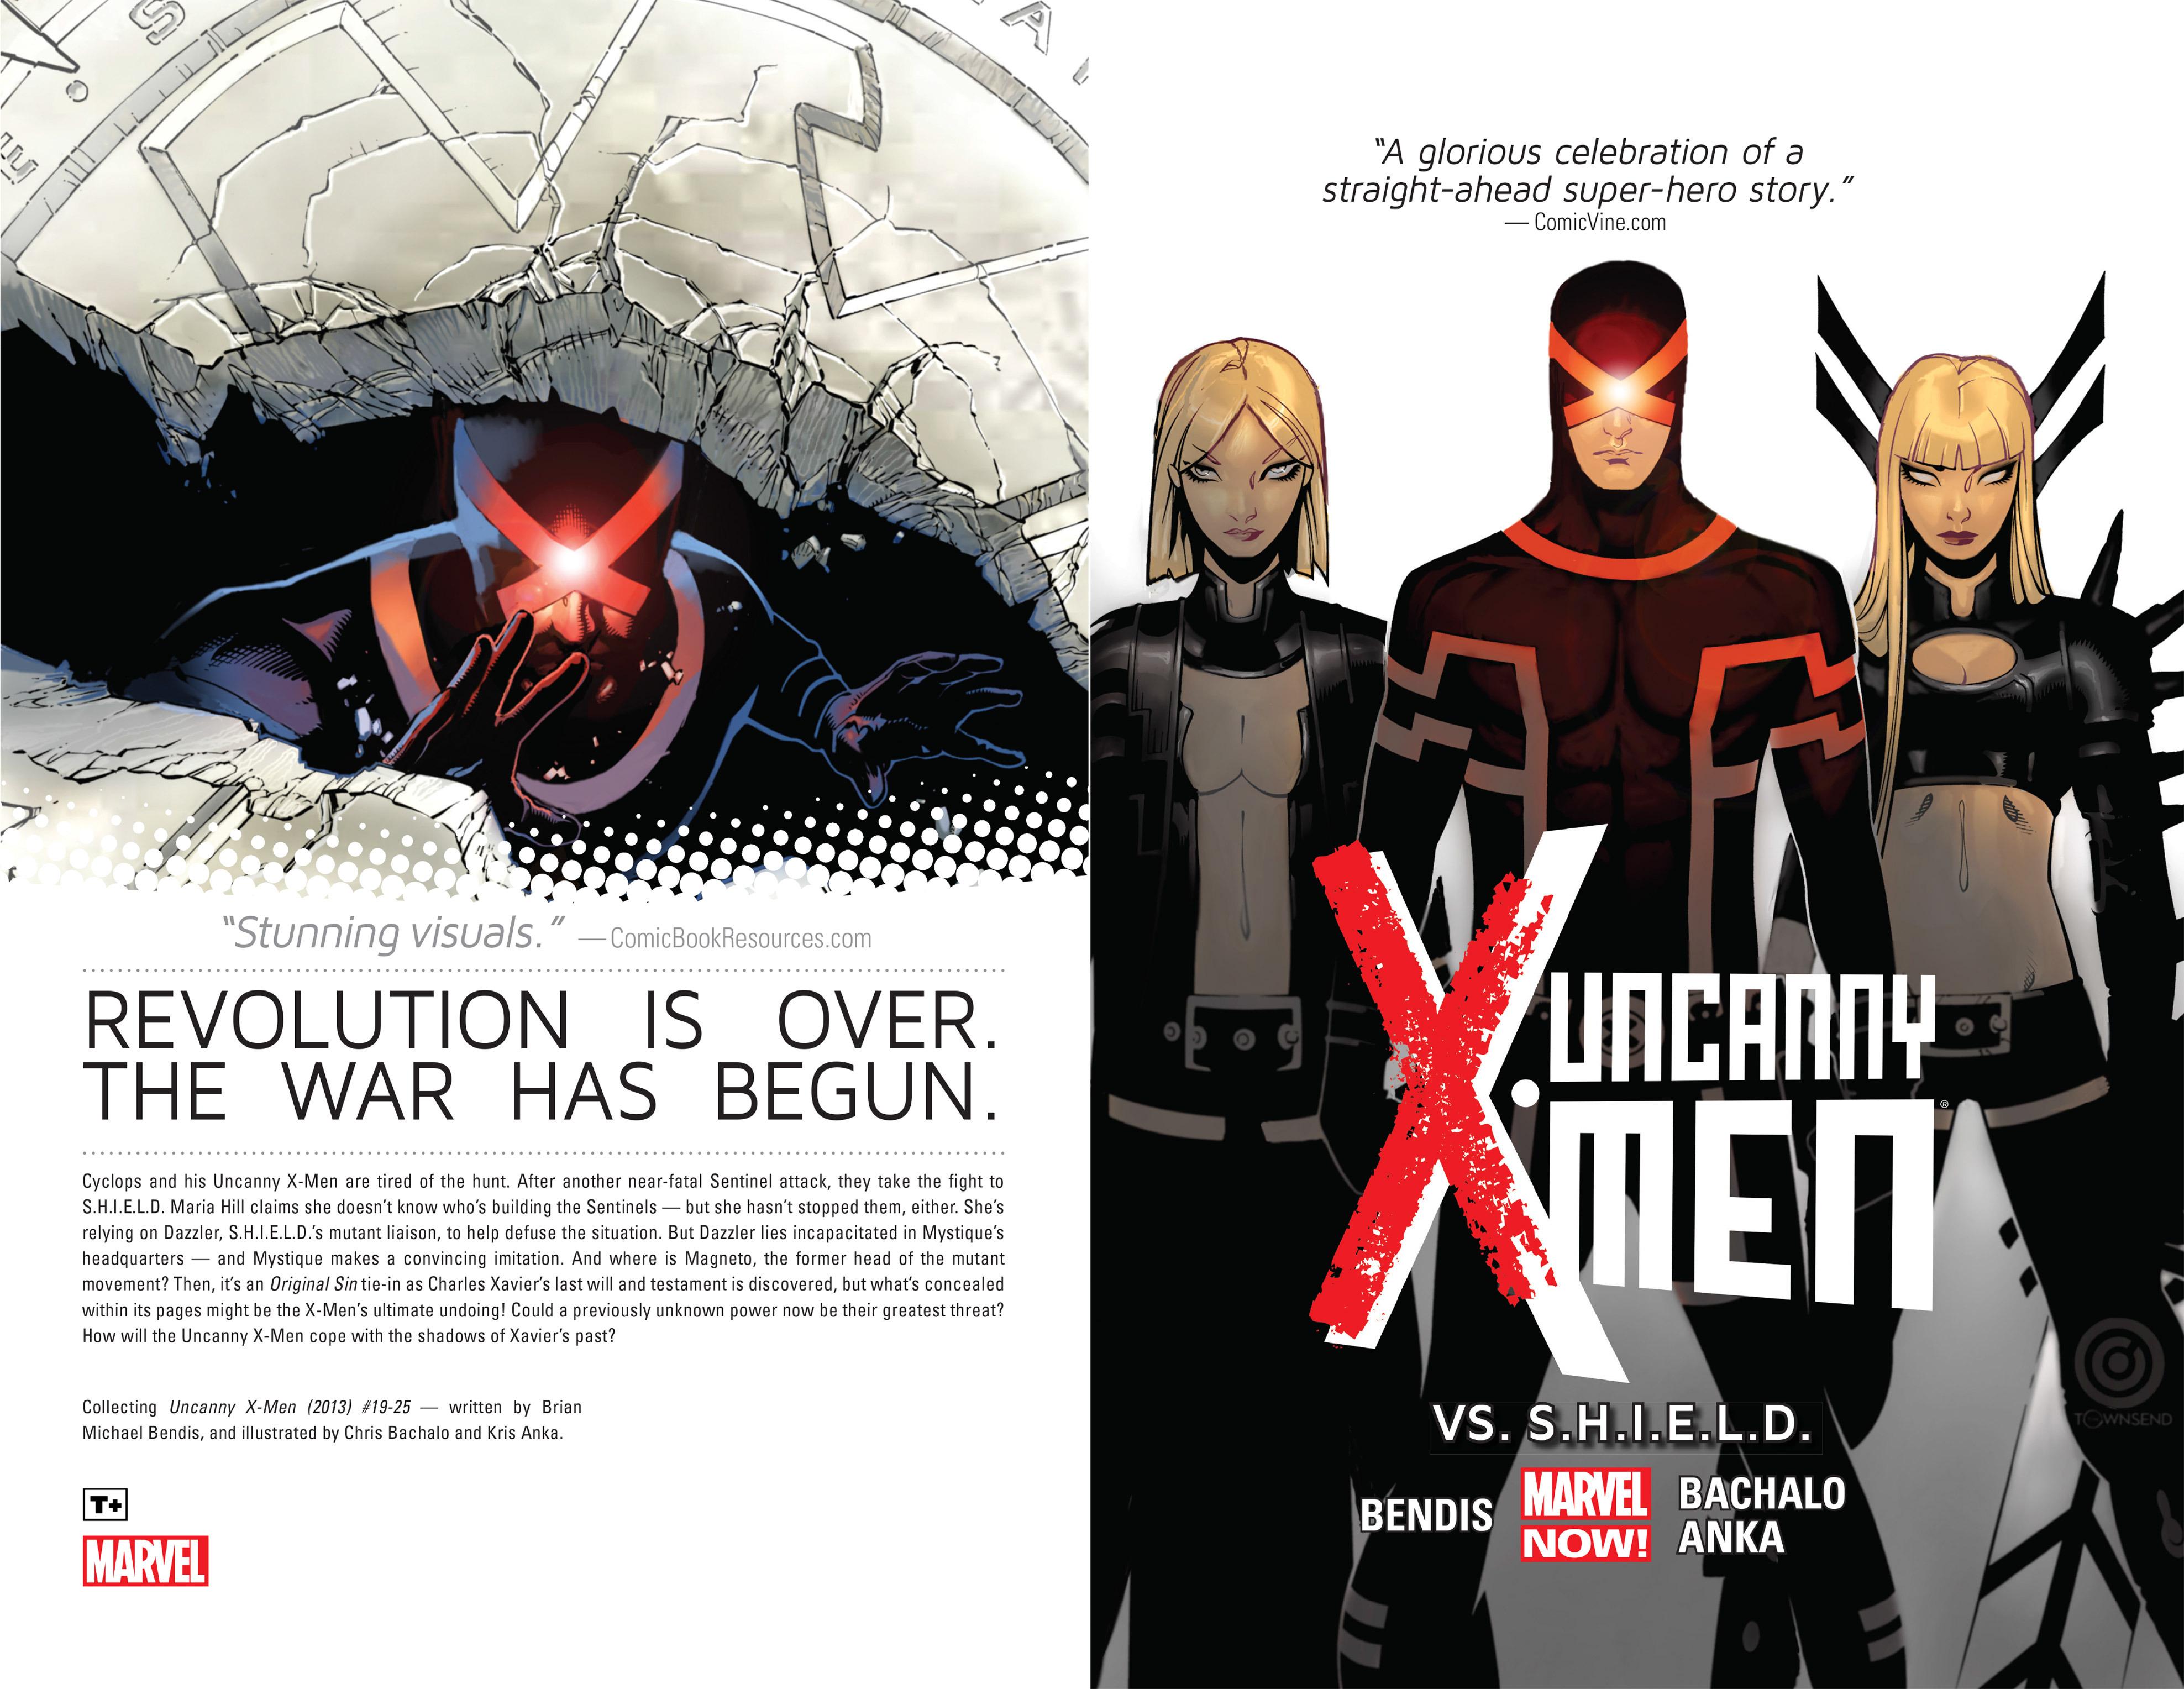 Read online Uncanny X-Men (2013) comic -  Issue # _TPB 4 - vs. S.H.I.E.L.D - 2